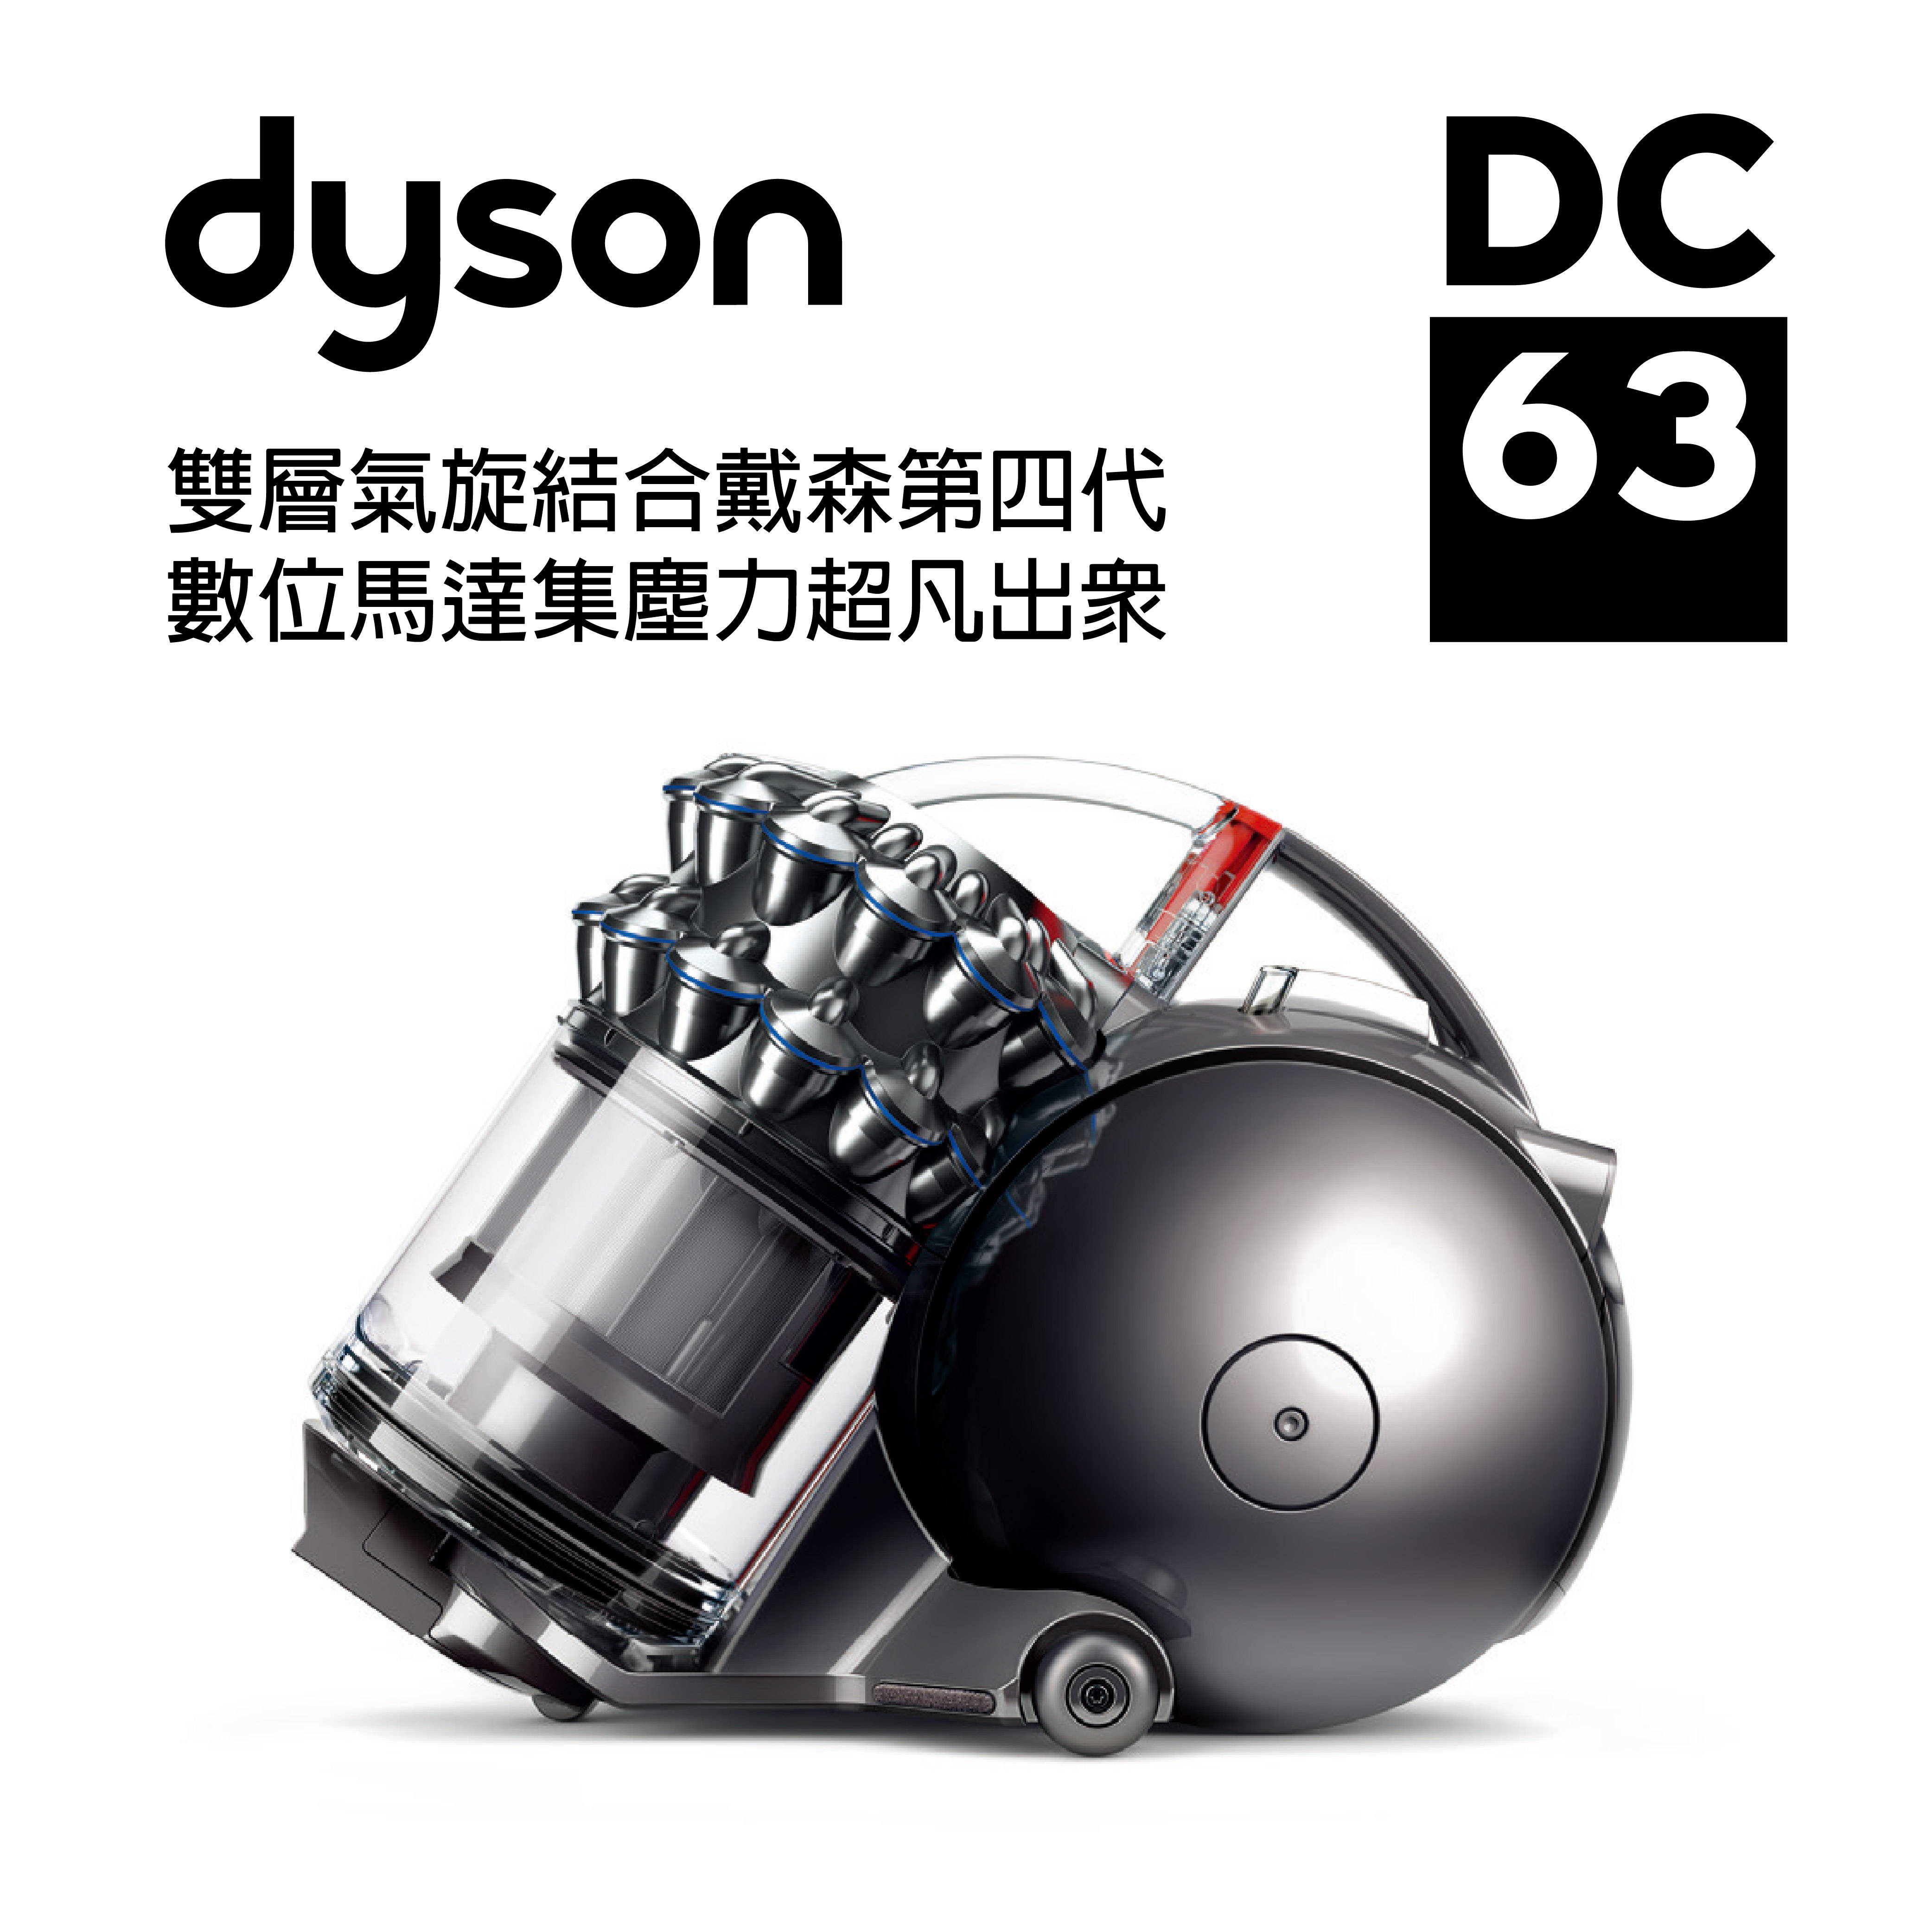 Dyson DC63 圓筒式吸塵器銀藍色 [極限量福利品]